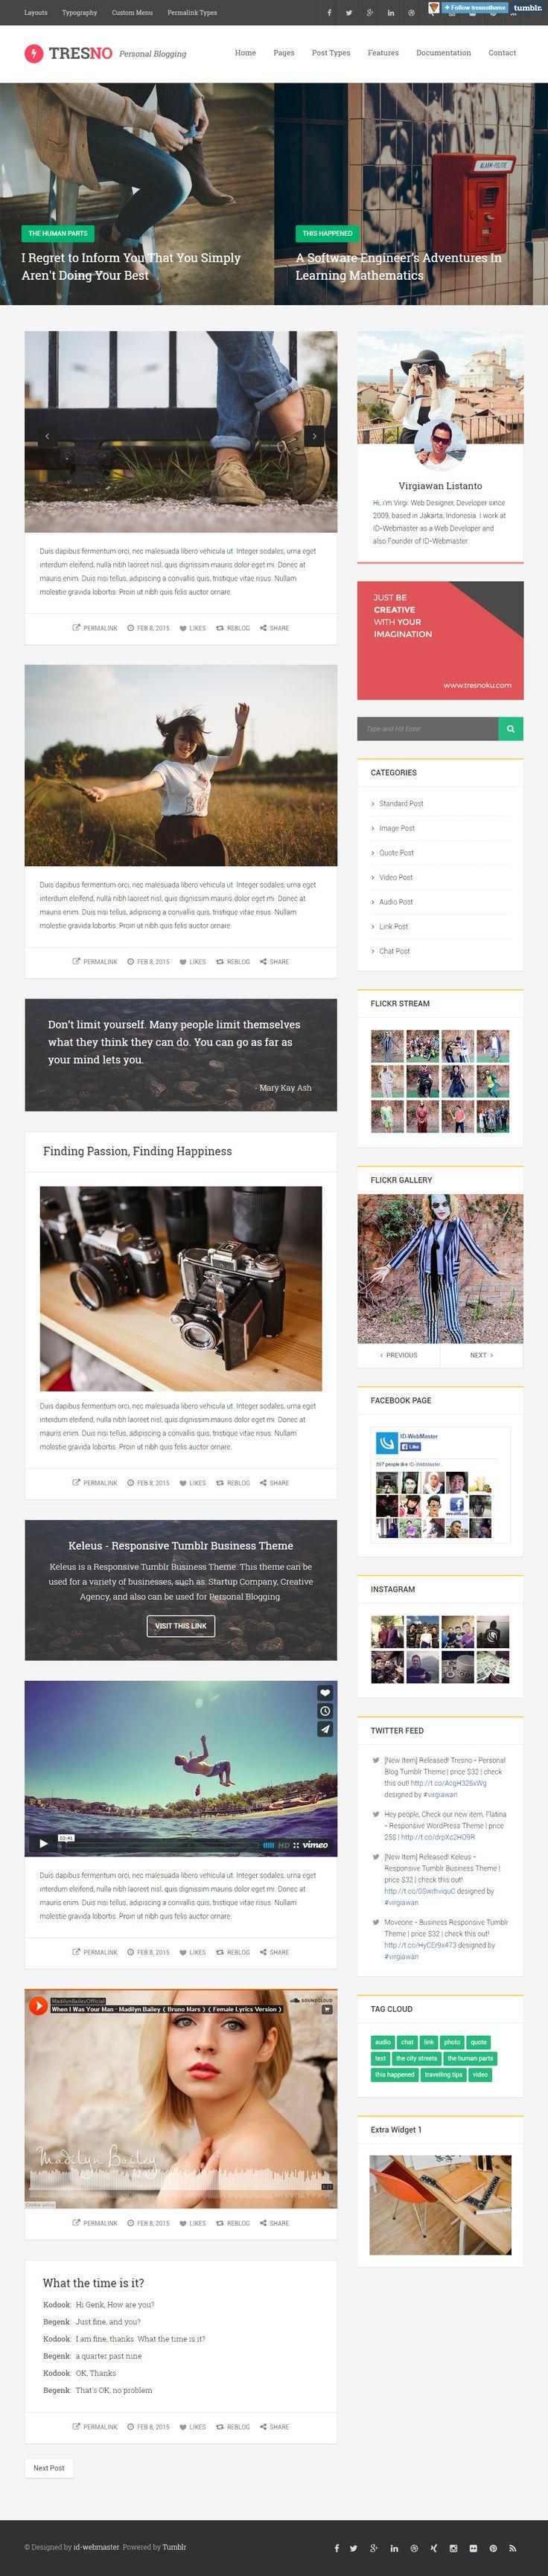 Tresno is Premium full Responsive Tumblr Blog Theme. Retina Ready. Bootstrap Framework. Disqus integration.Google Analytics. Test free demo at: http://www.responsivemiracle.com/cms/tresno-premium-responsive-personal-blog-tumblr-theme/